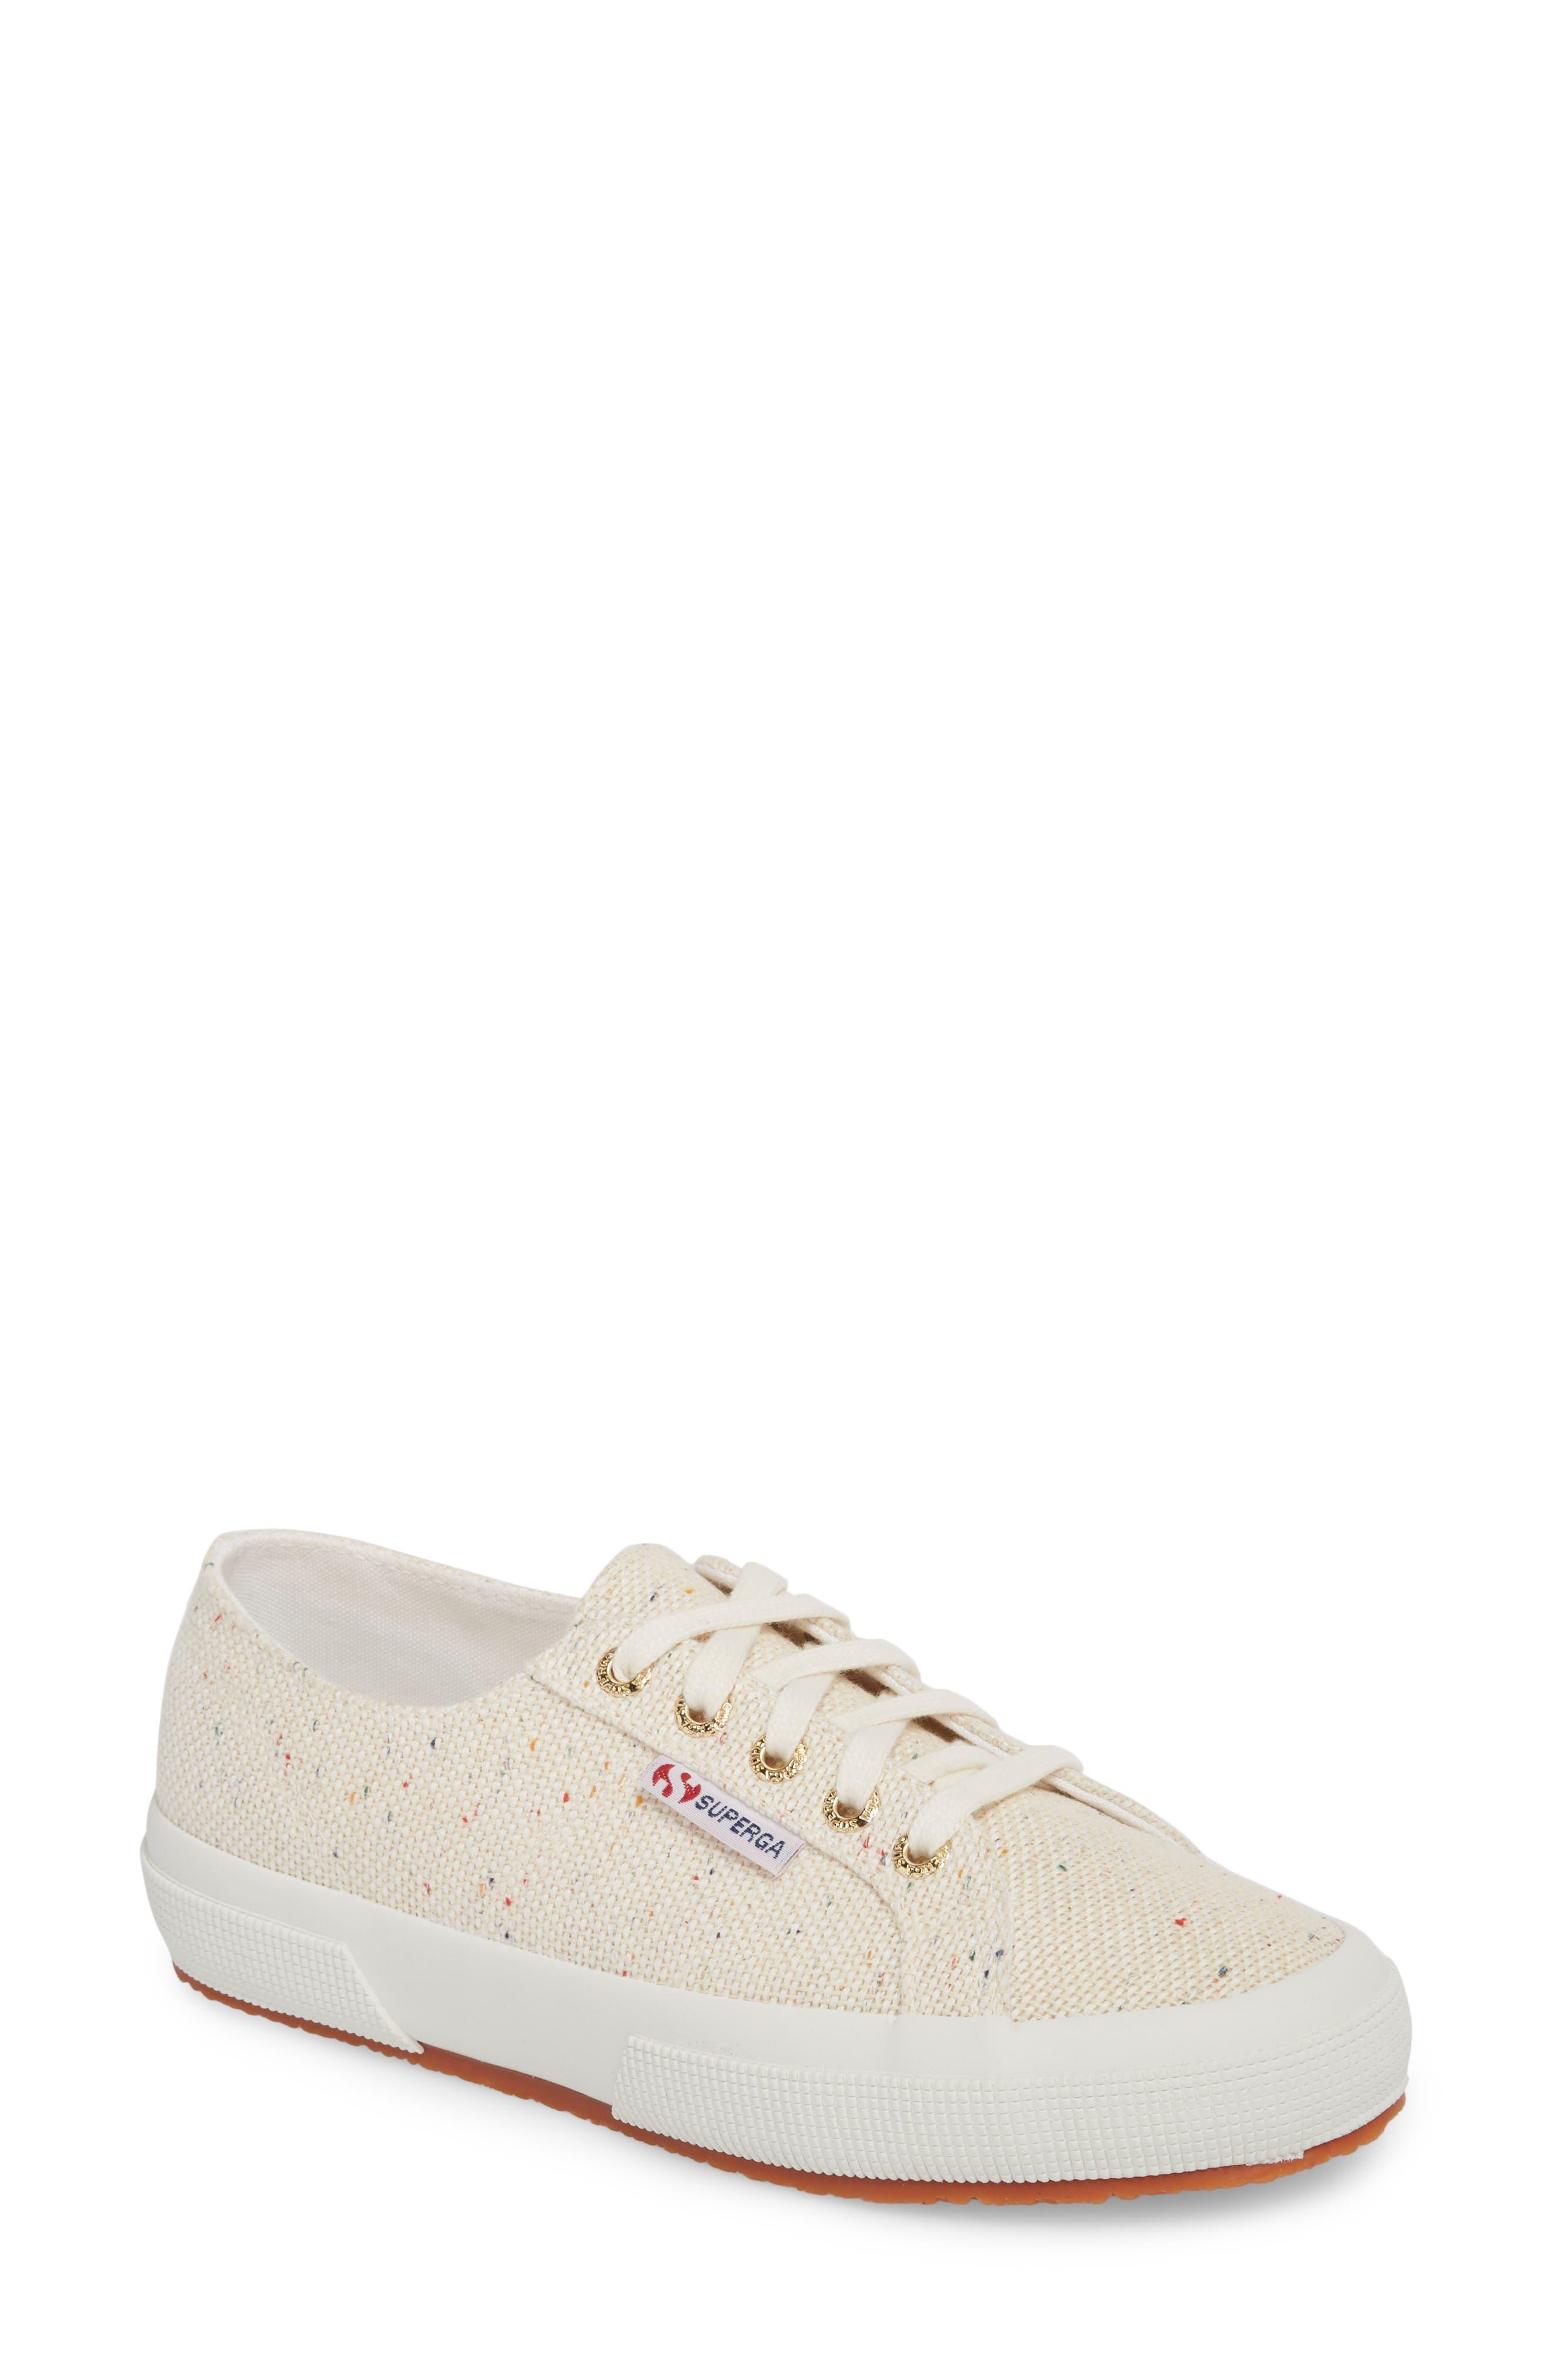 SUPERGA 2750 Speckle Low Top Sneaker, Main, color, 900